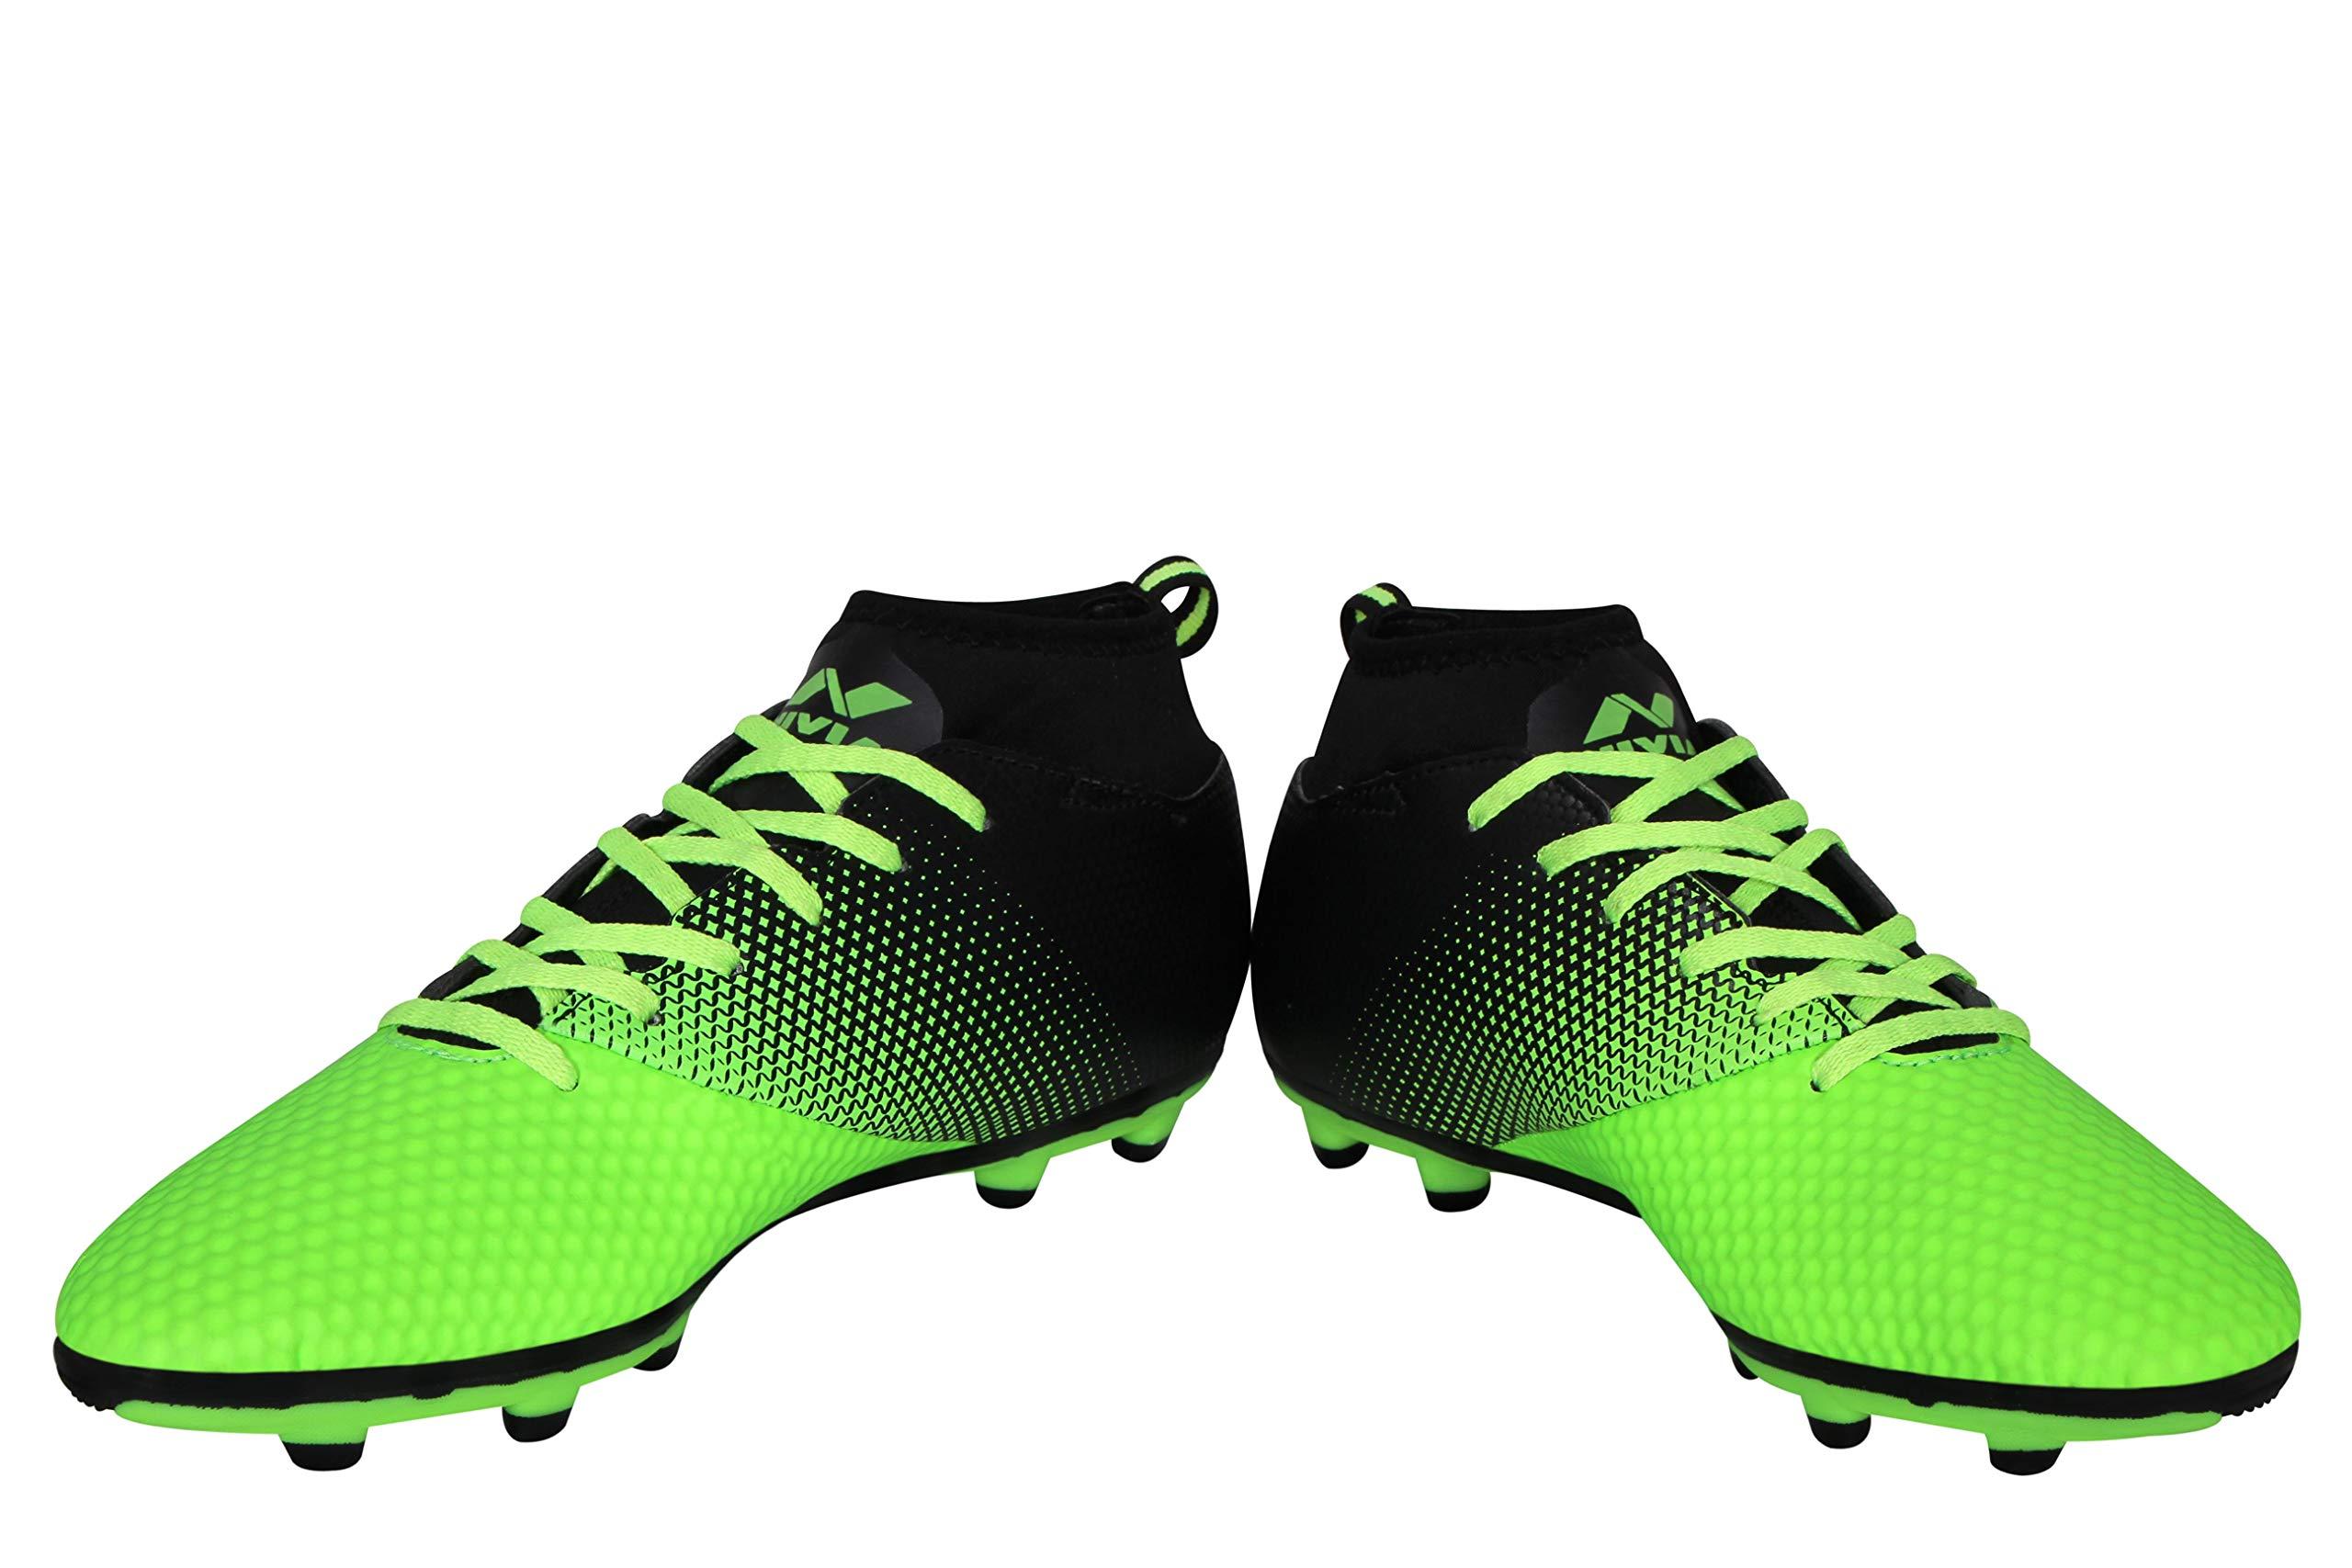 Nivia Ashtang Football Stud (3, Green) (B07JWXVKG6) Amazon Price History, Amazon Price Tracker